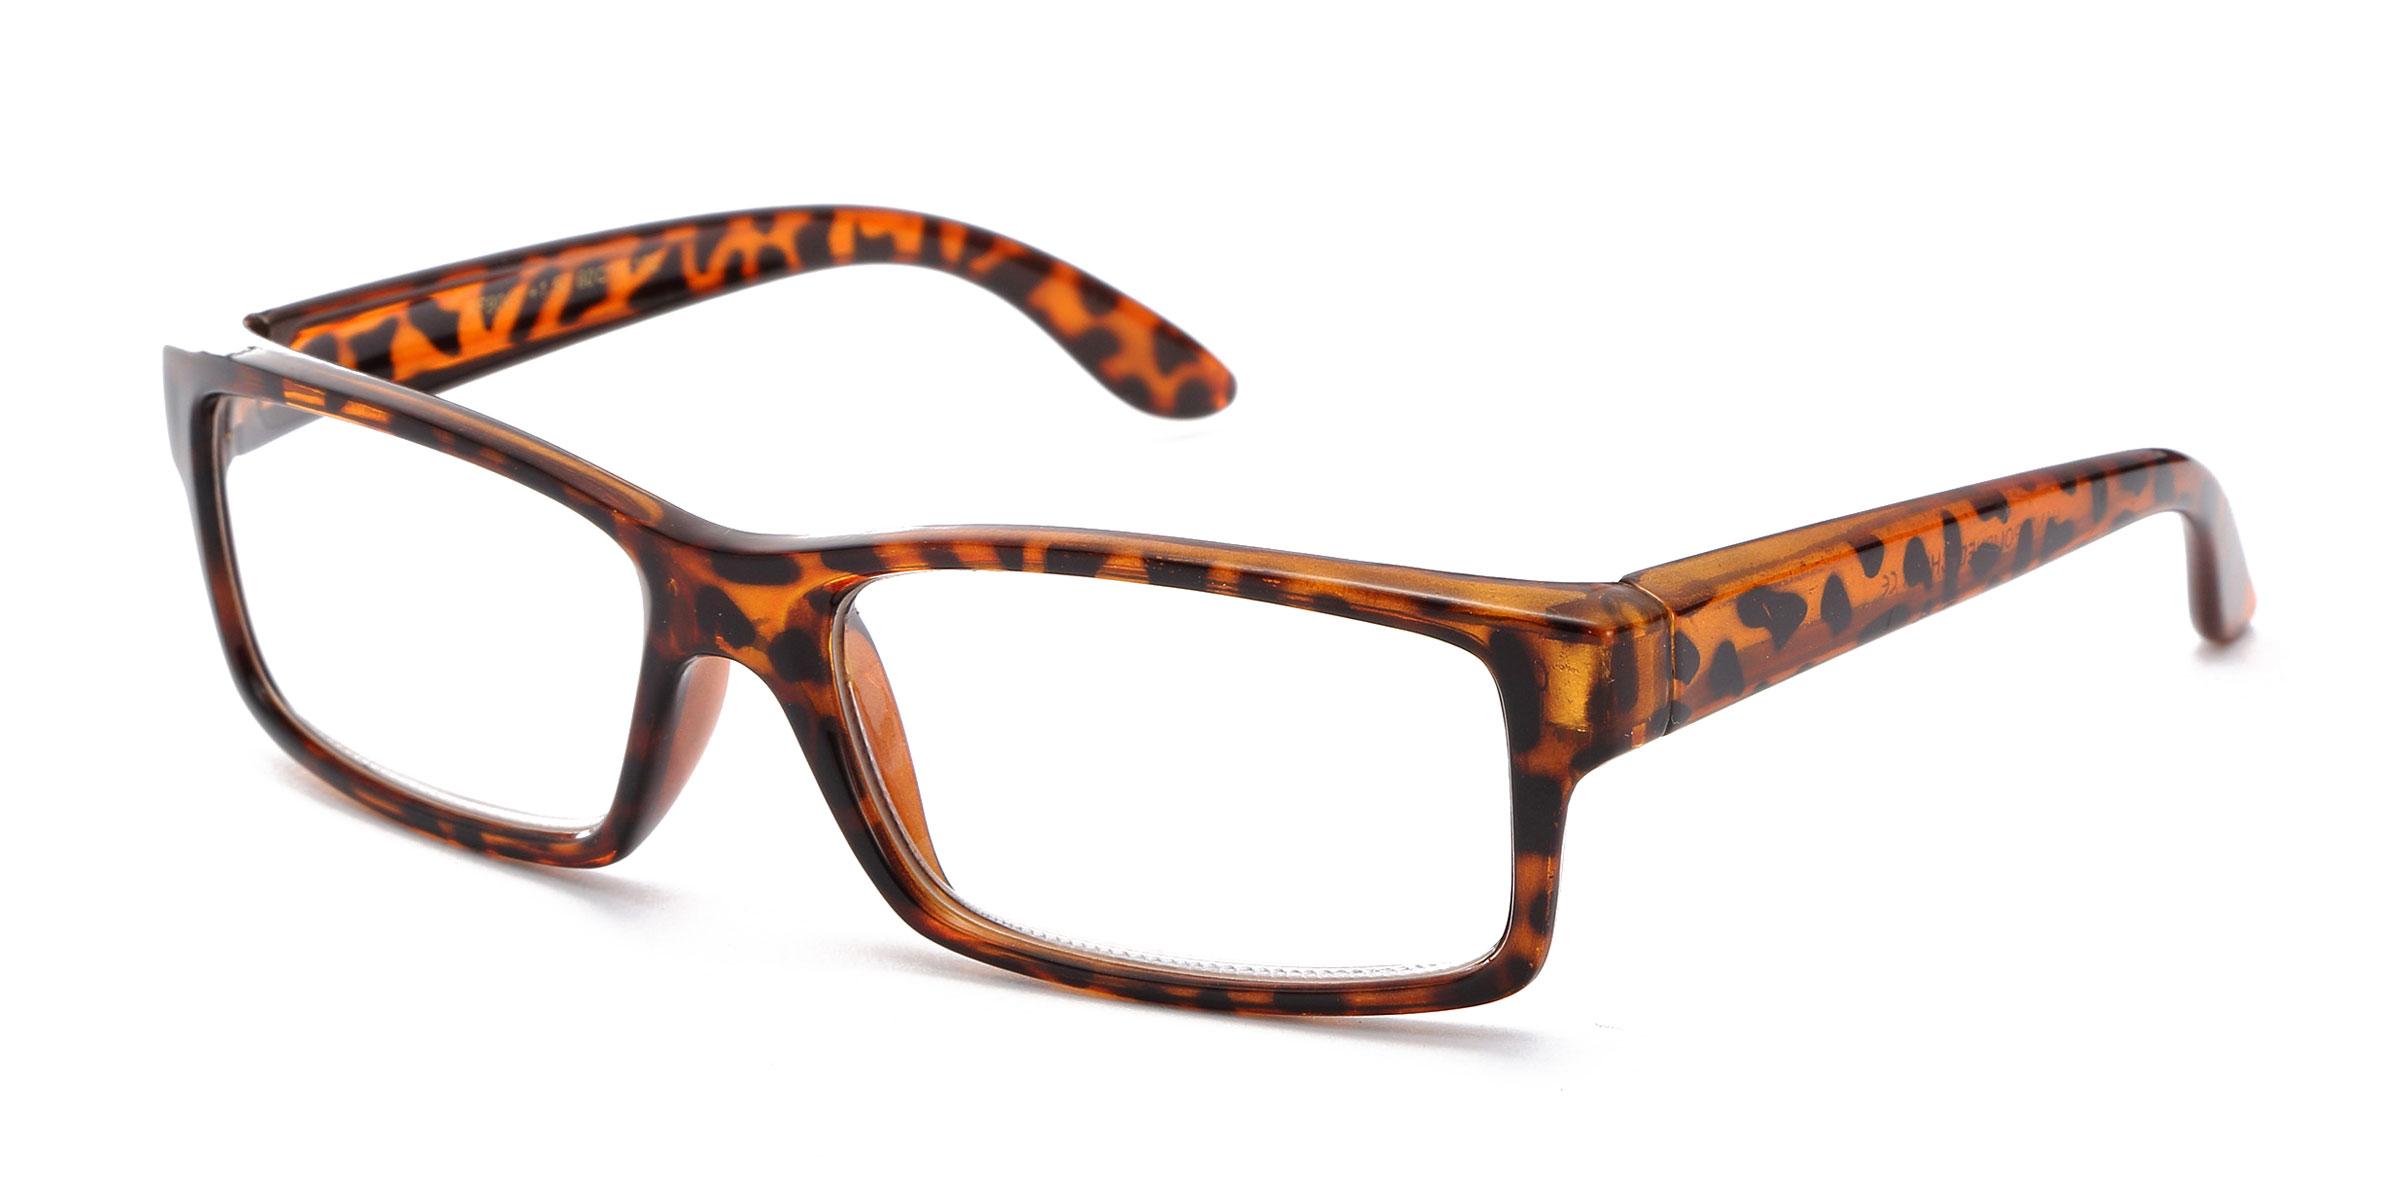 Glasses Frame Structure : 2 Pack Tortoise Frame Bold Frame Reading Prescription ...